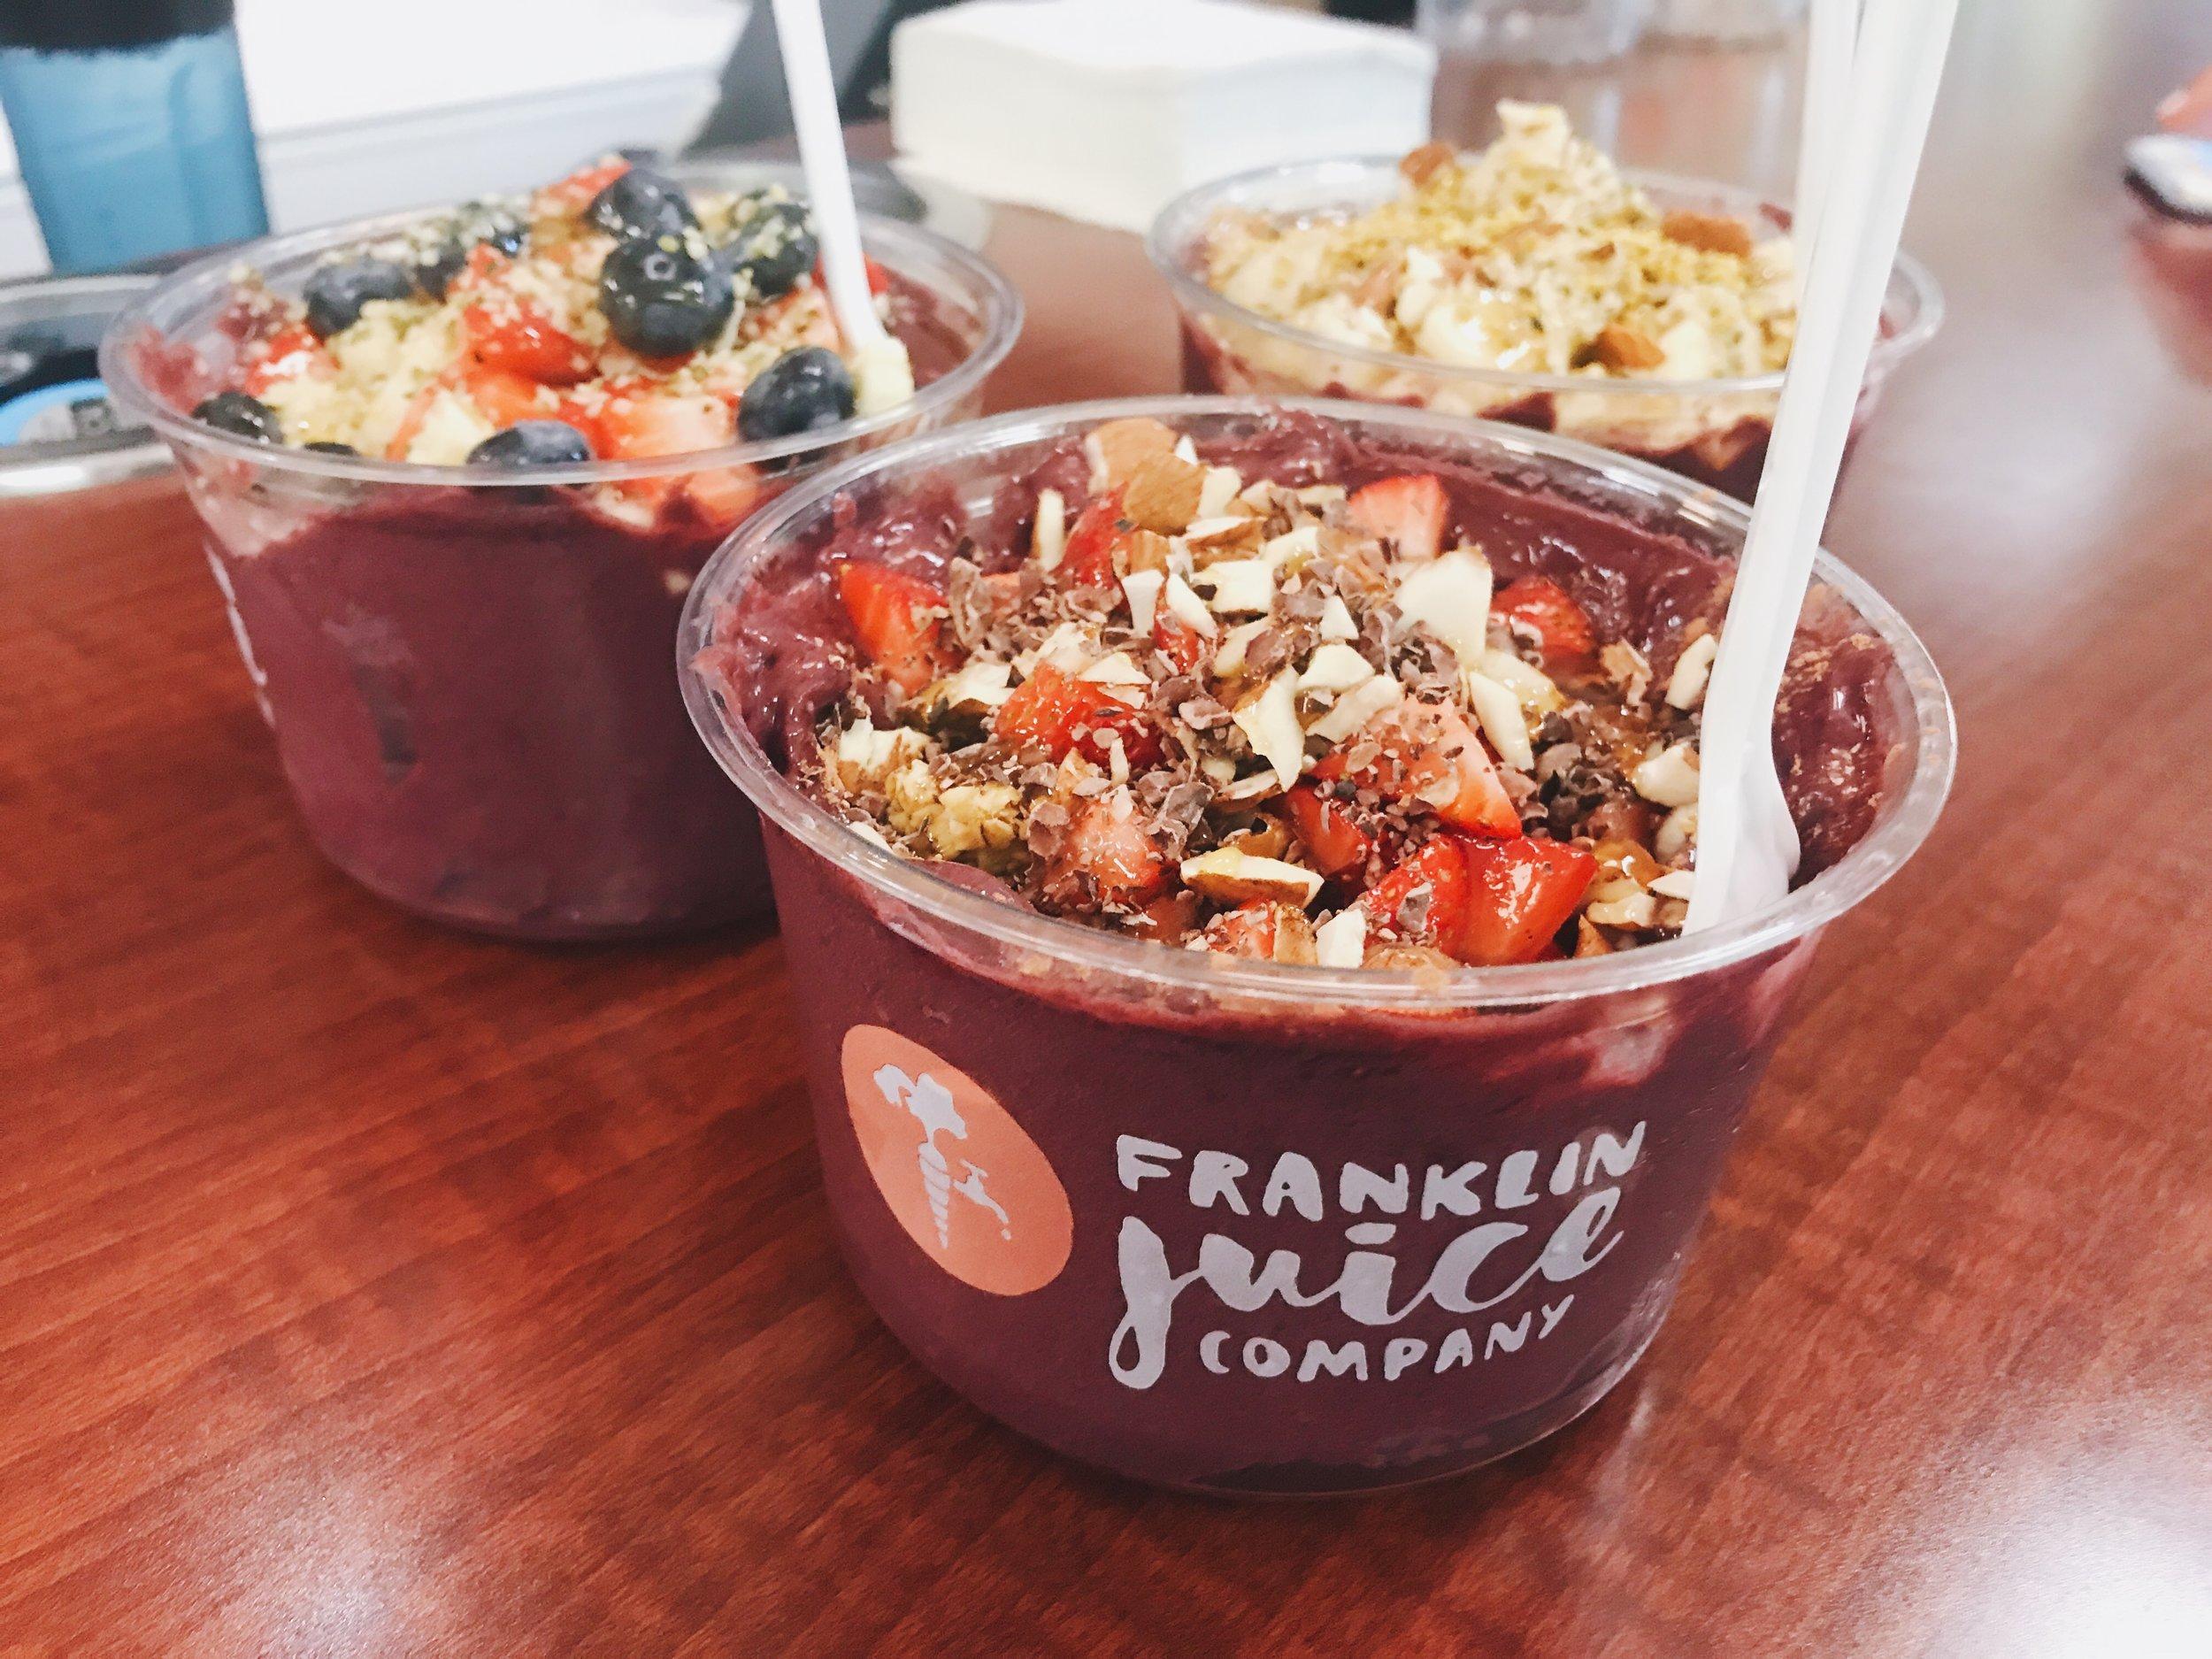 Franklin Juice Co